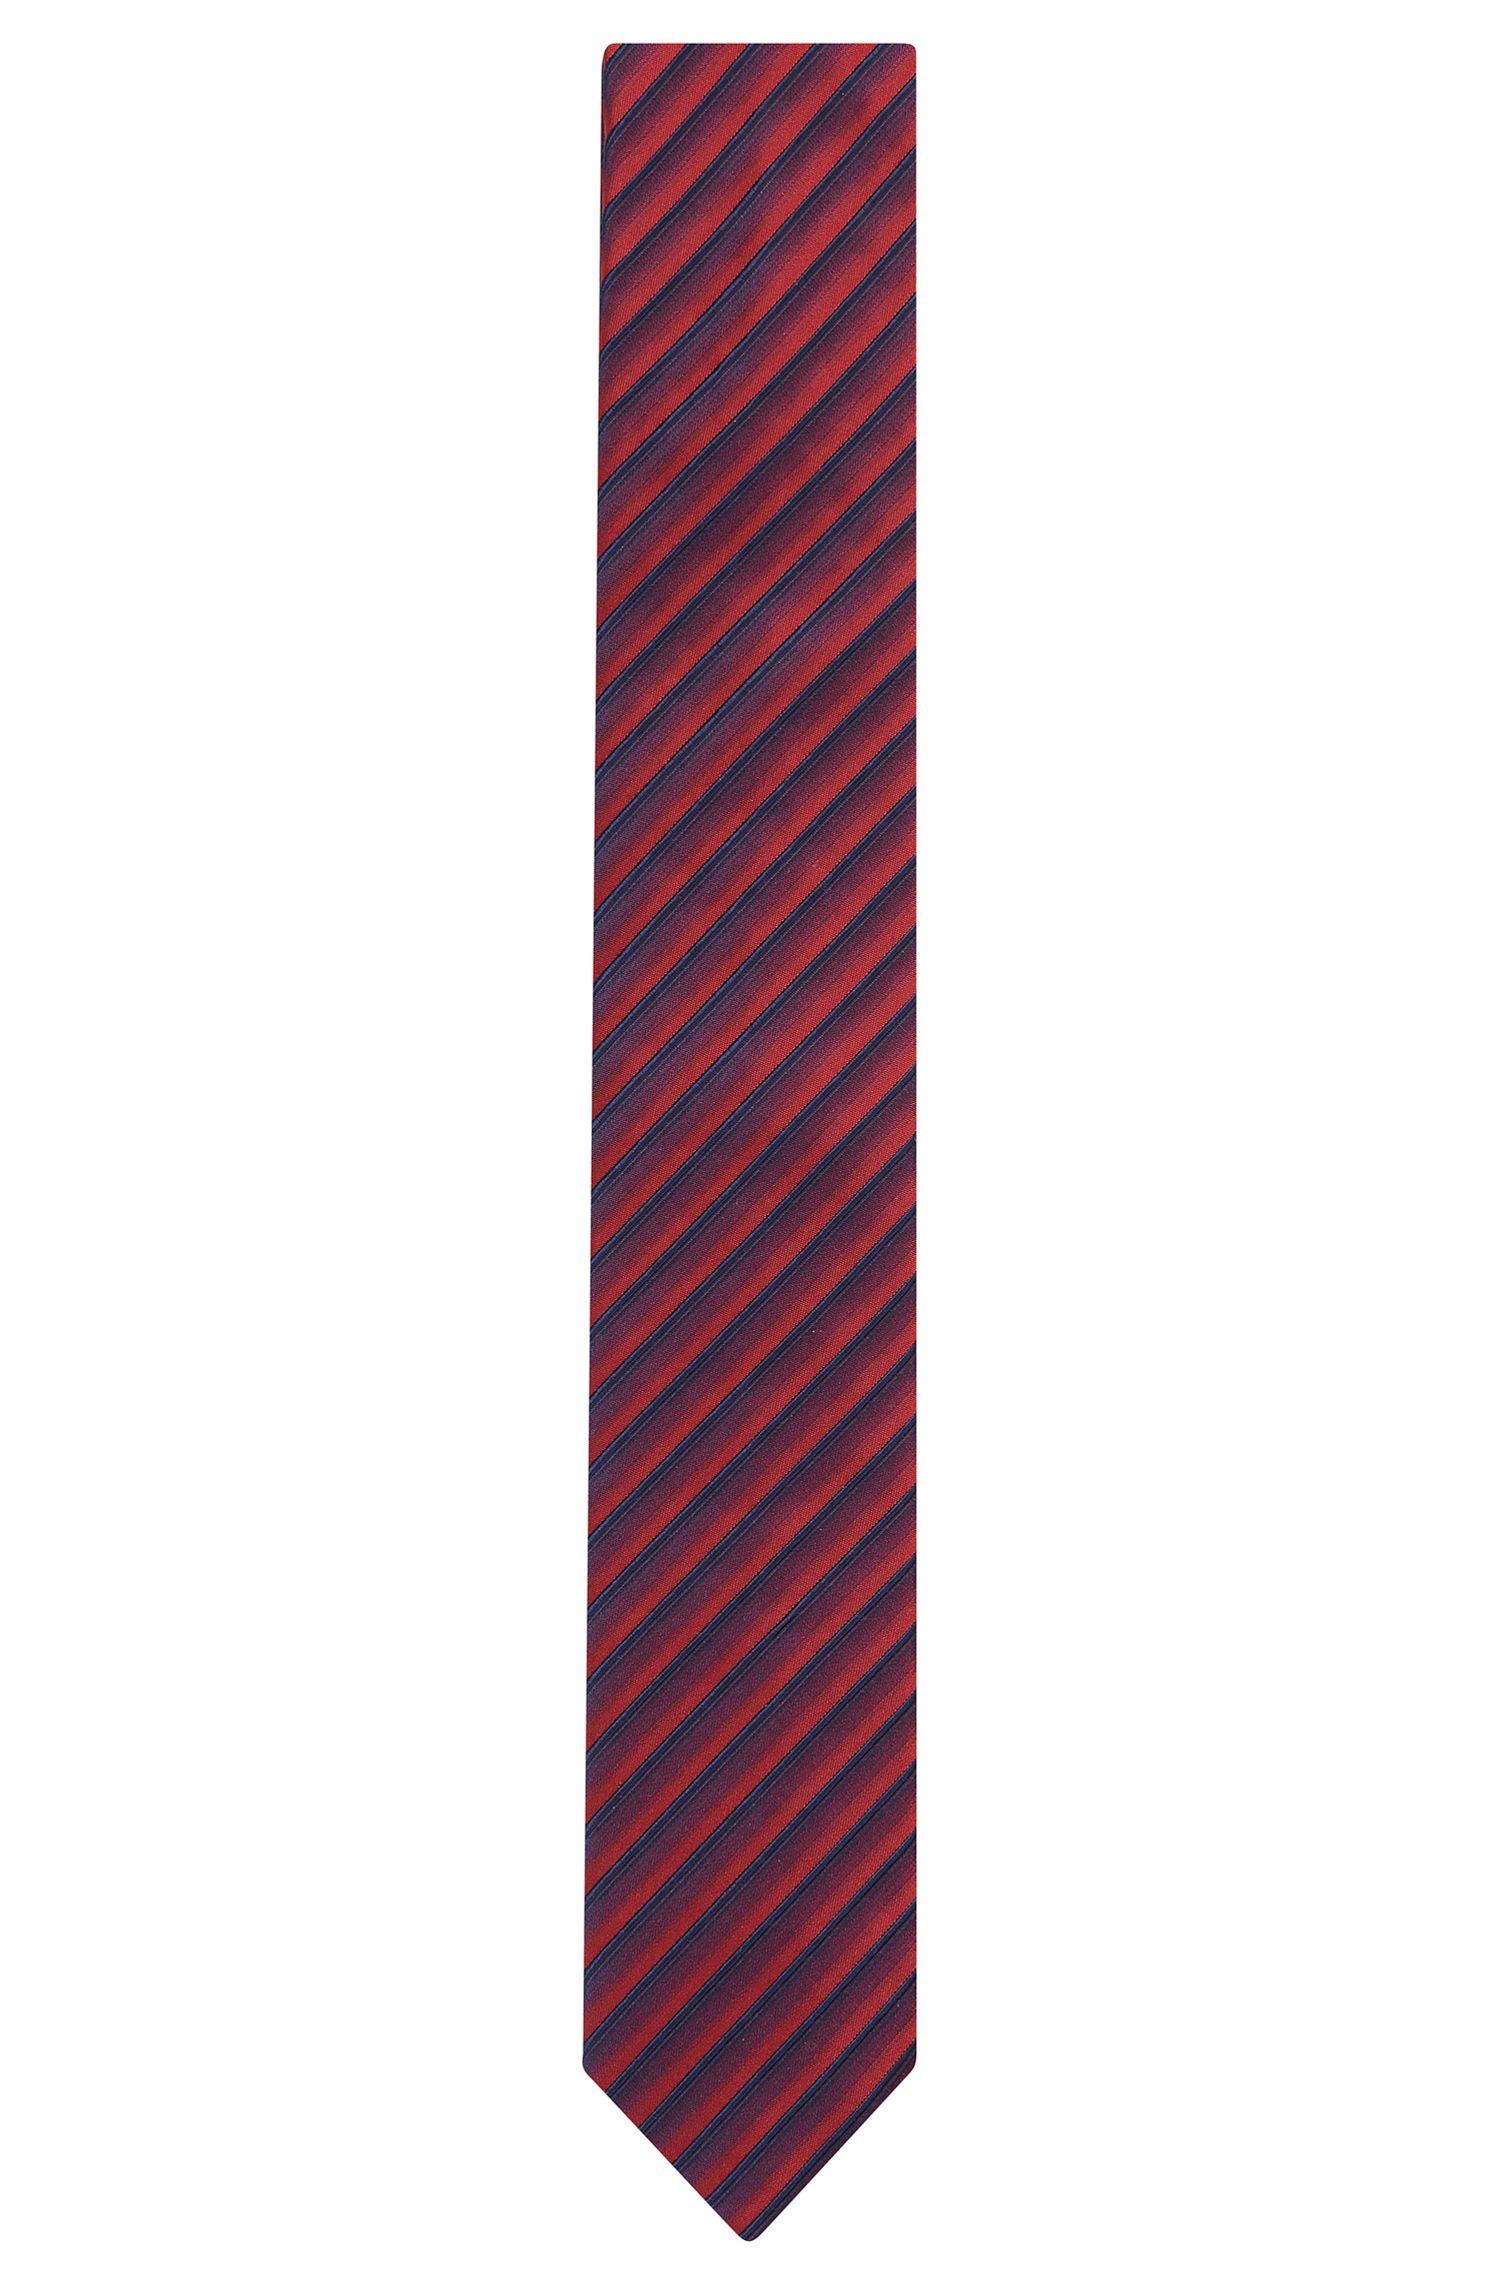 'Tie 6 cm' | Slim, Cotton Silk Tie